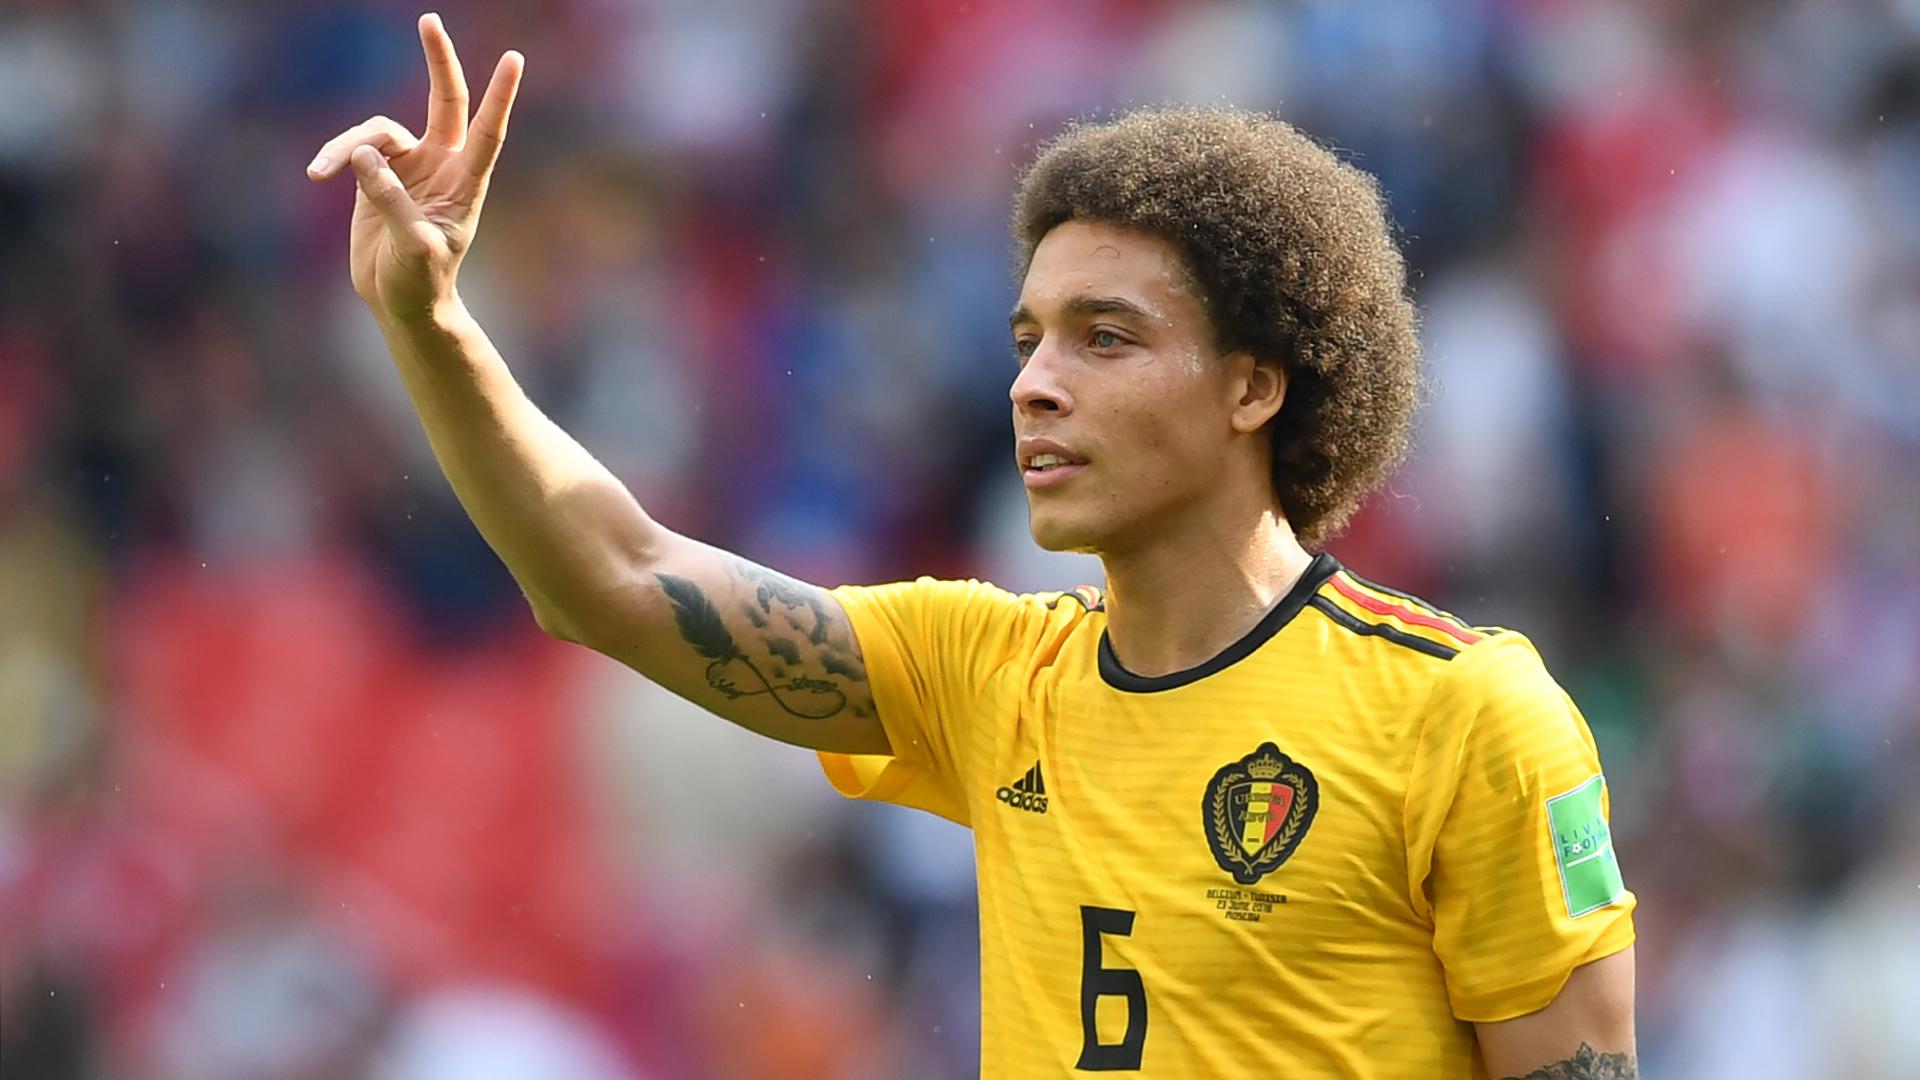 Axel Witsel Belgium BVB Borussia Dortmund